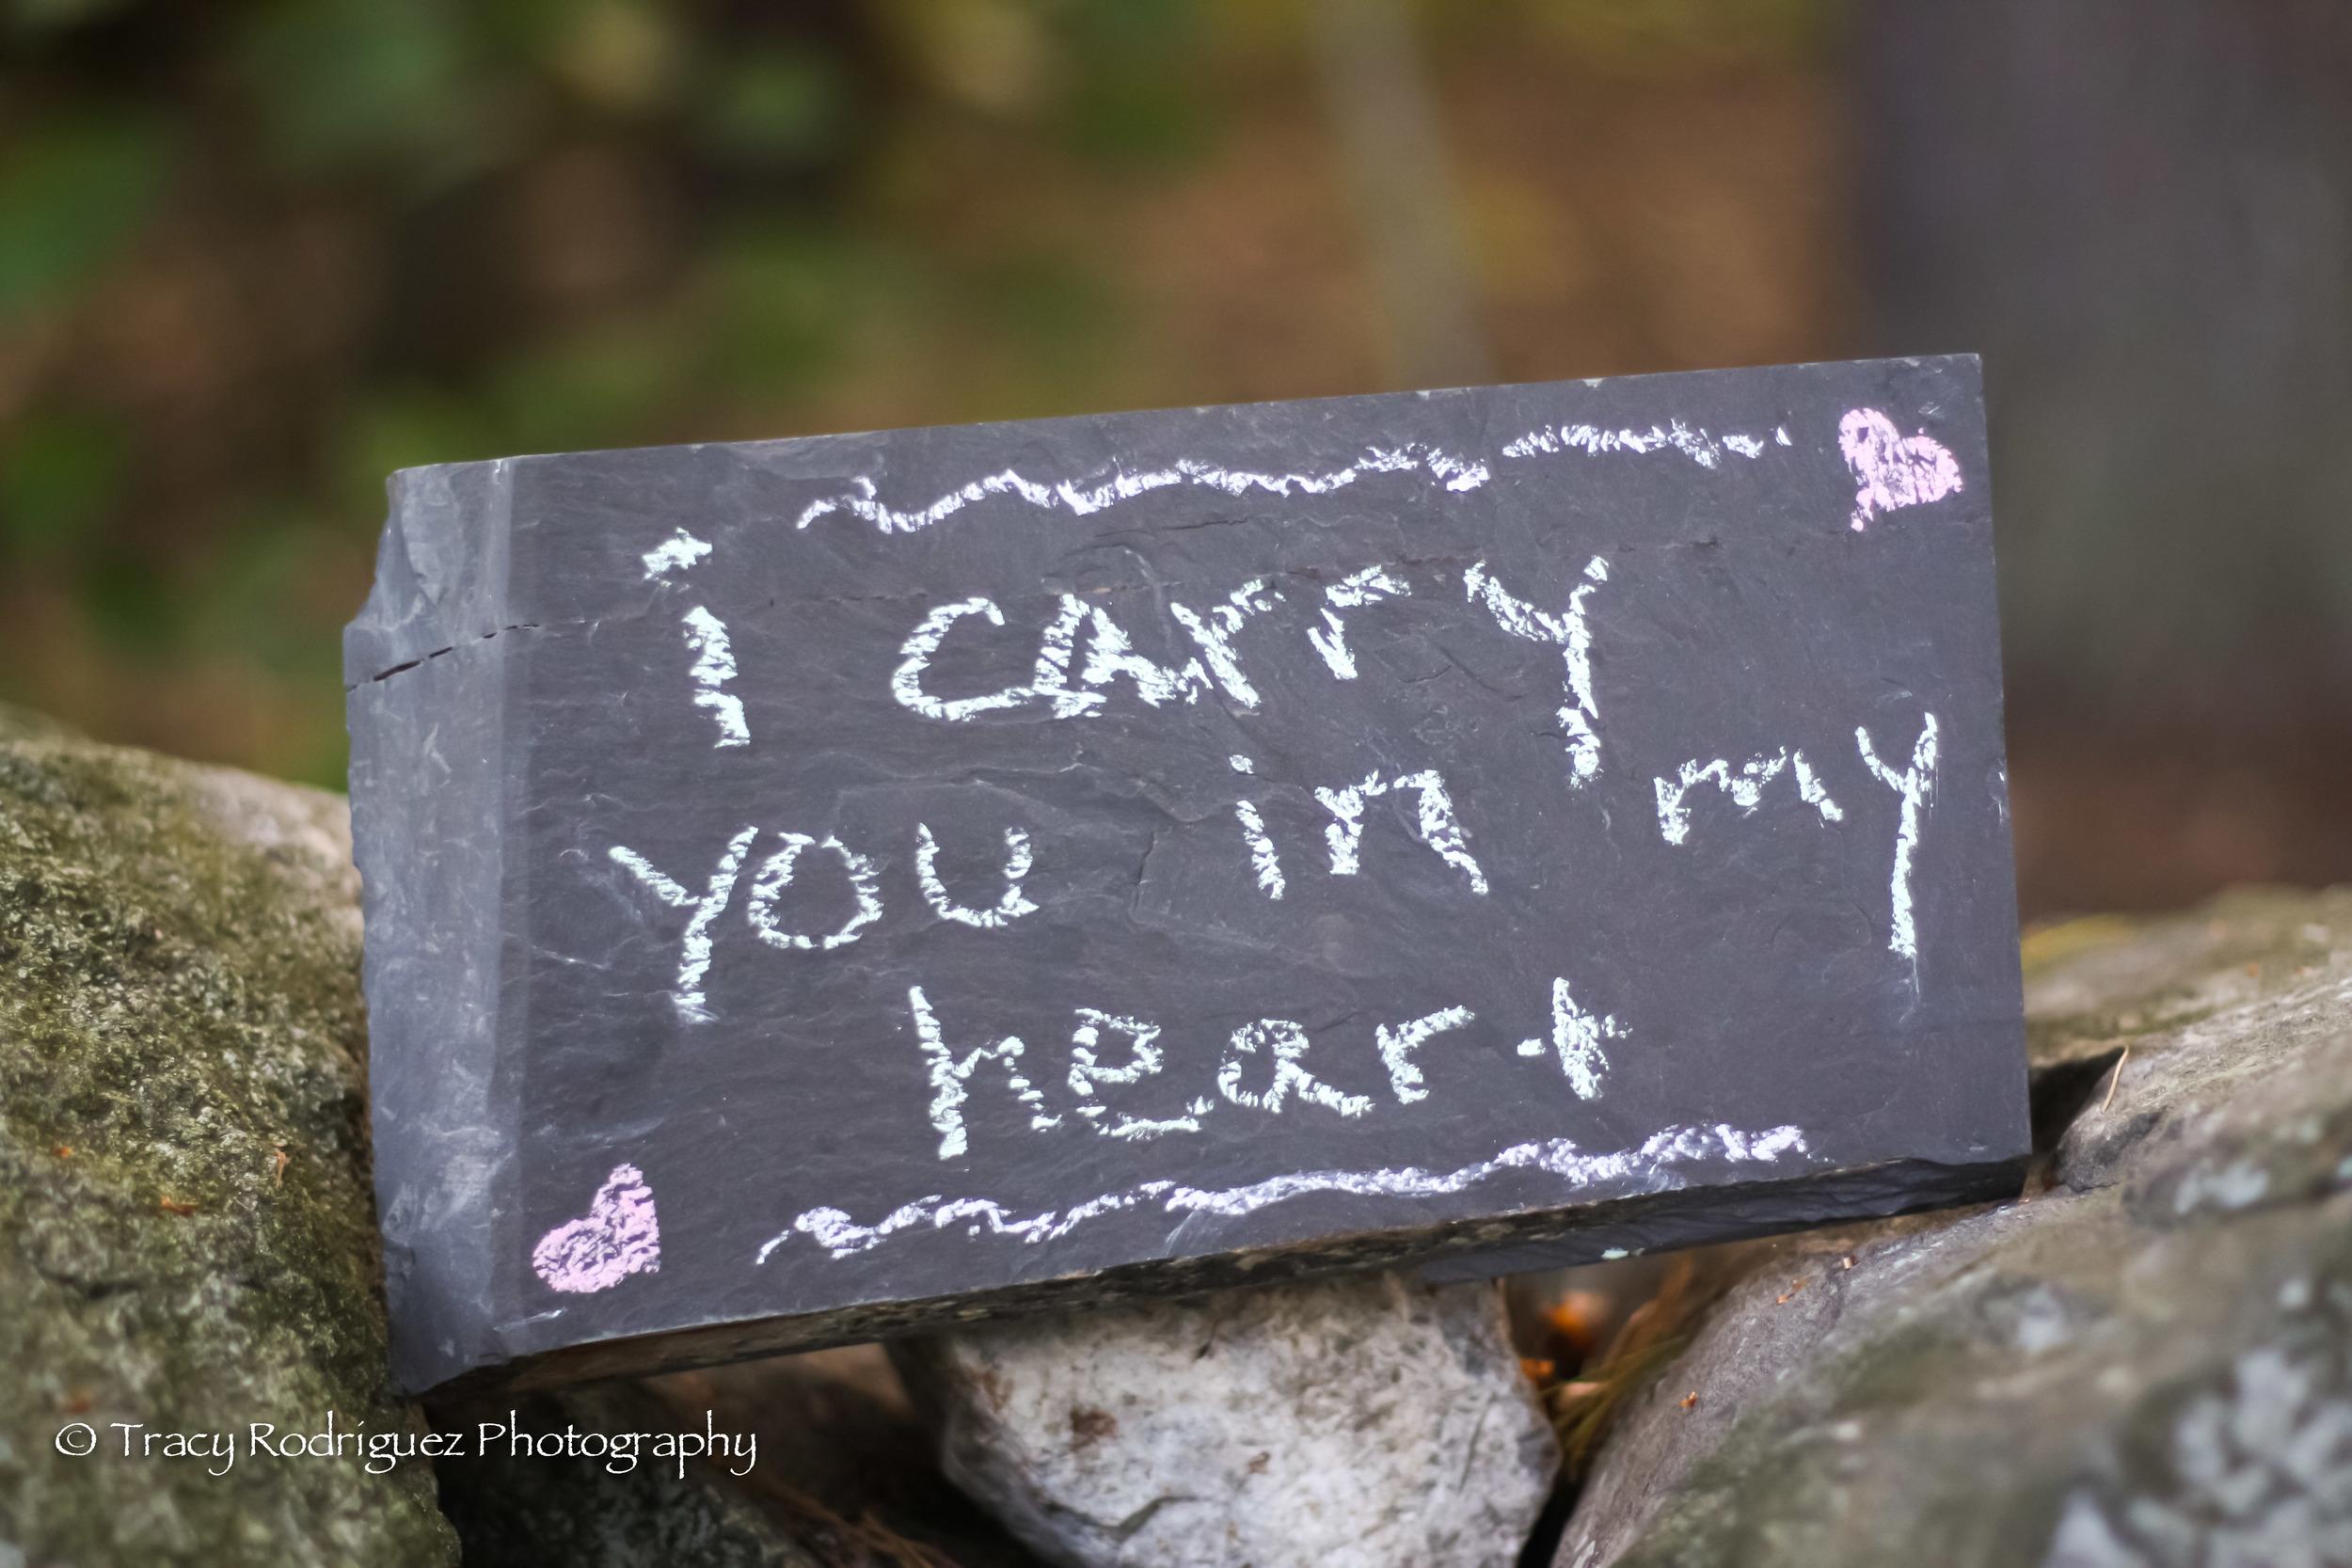 Tracy_Rodriguez_Photography_Blog-0032.jpg